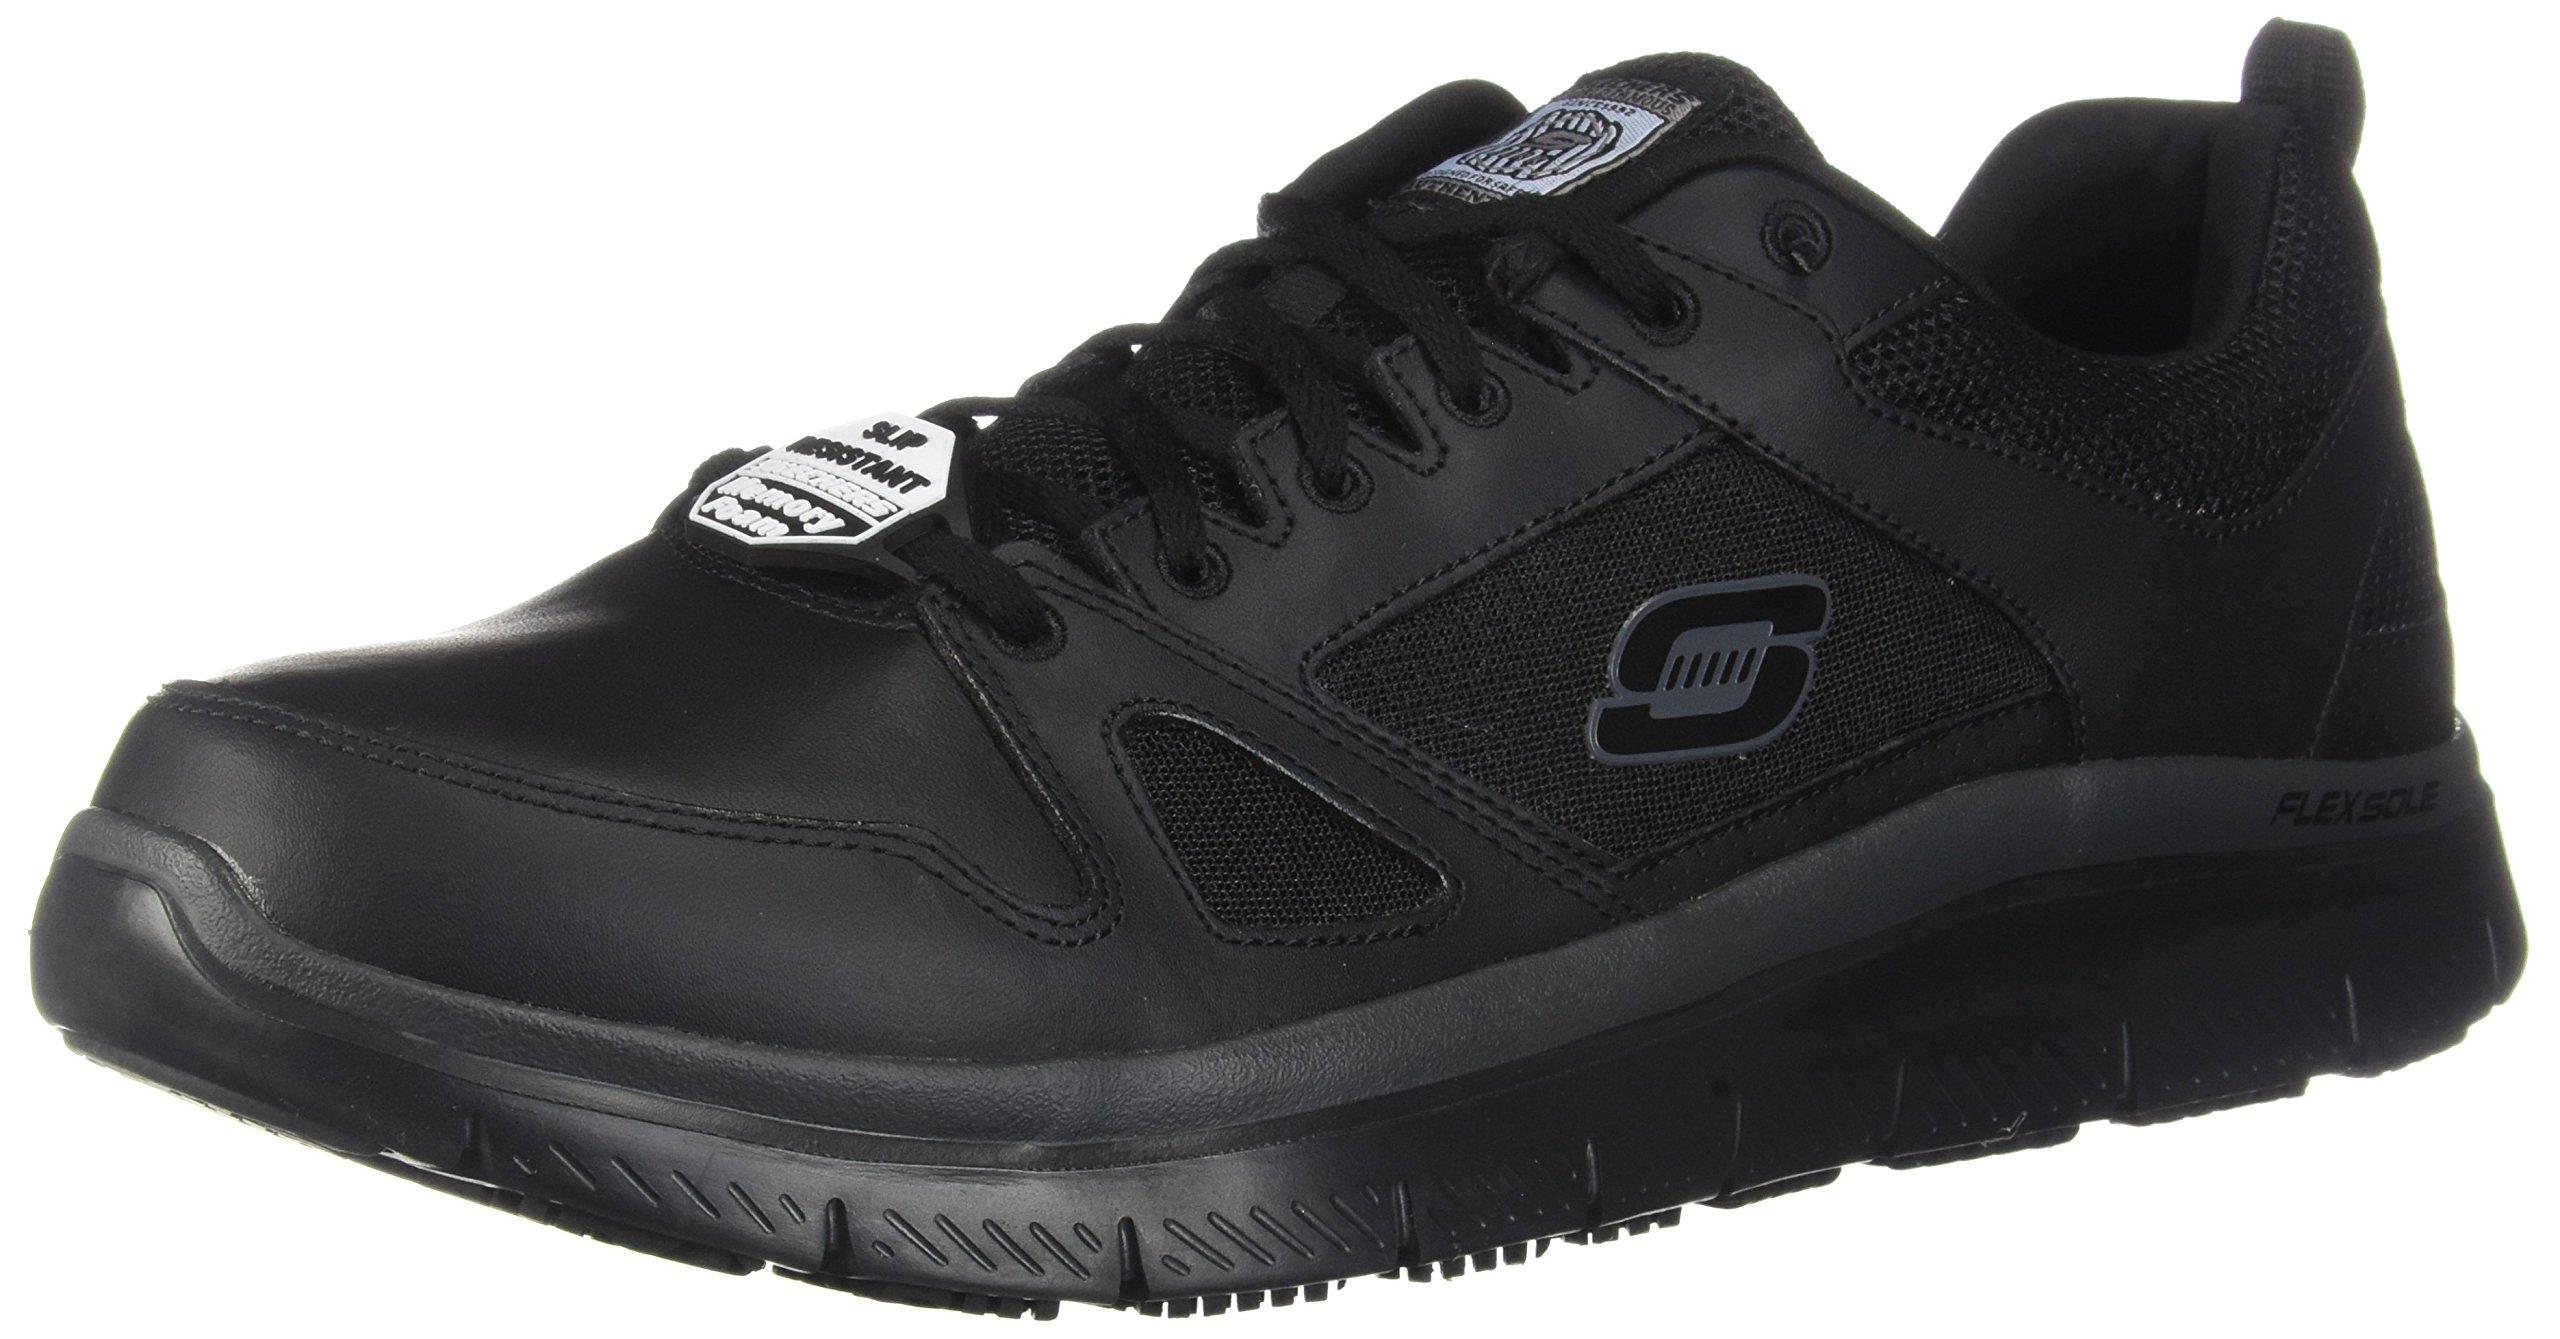 Men's Flex Advantage Sr Work Shoe